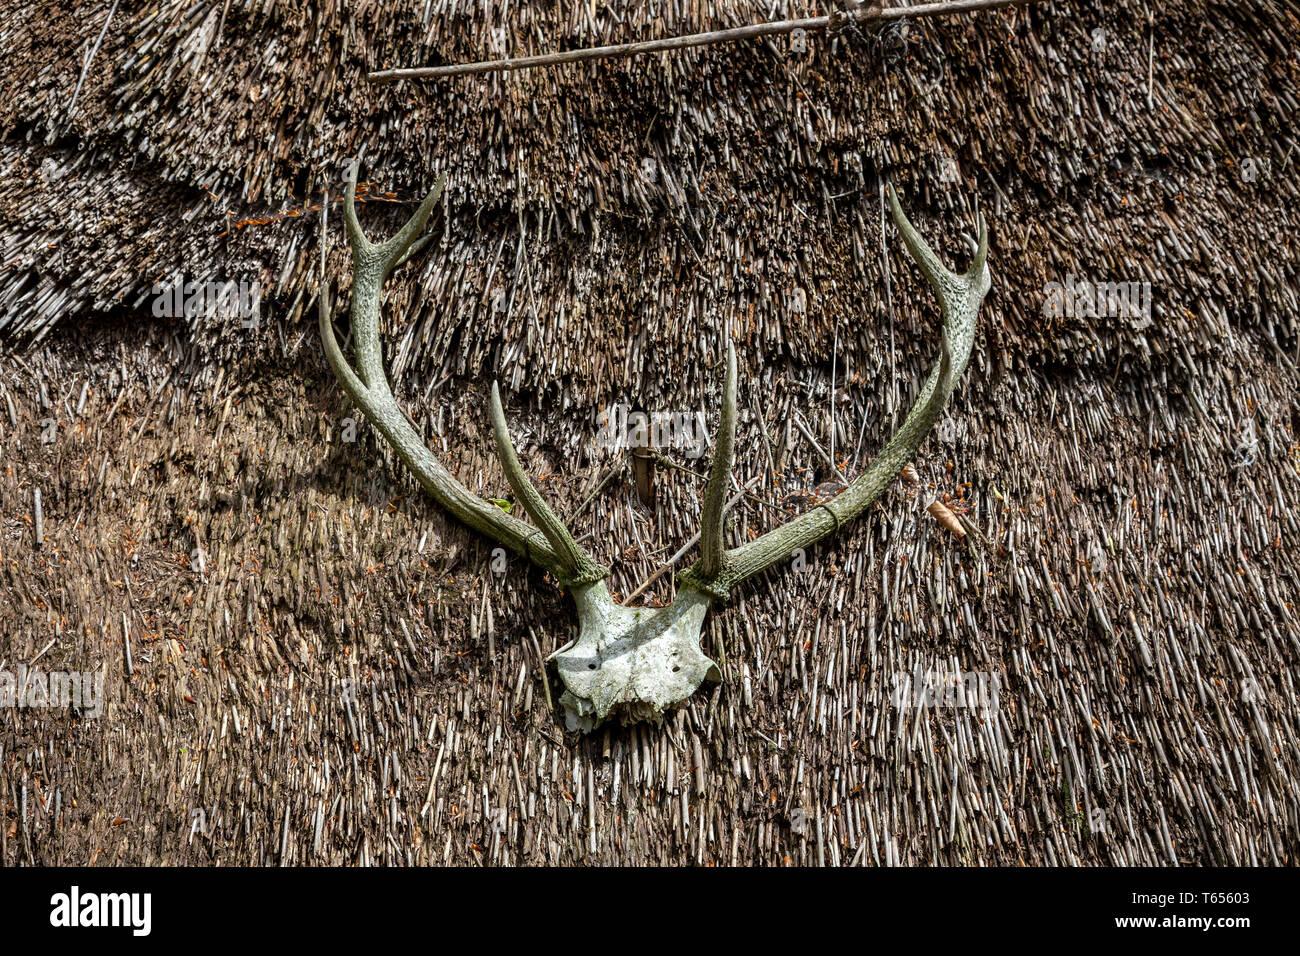 Deer, Antler, Animal, Animal Skull, Animal Head, Reindeer, Horned, Weathered, Animal Body Part, Animal Bone, Animal Skeleton, Bull - Animal, Close-up, - Stock Image